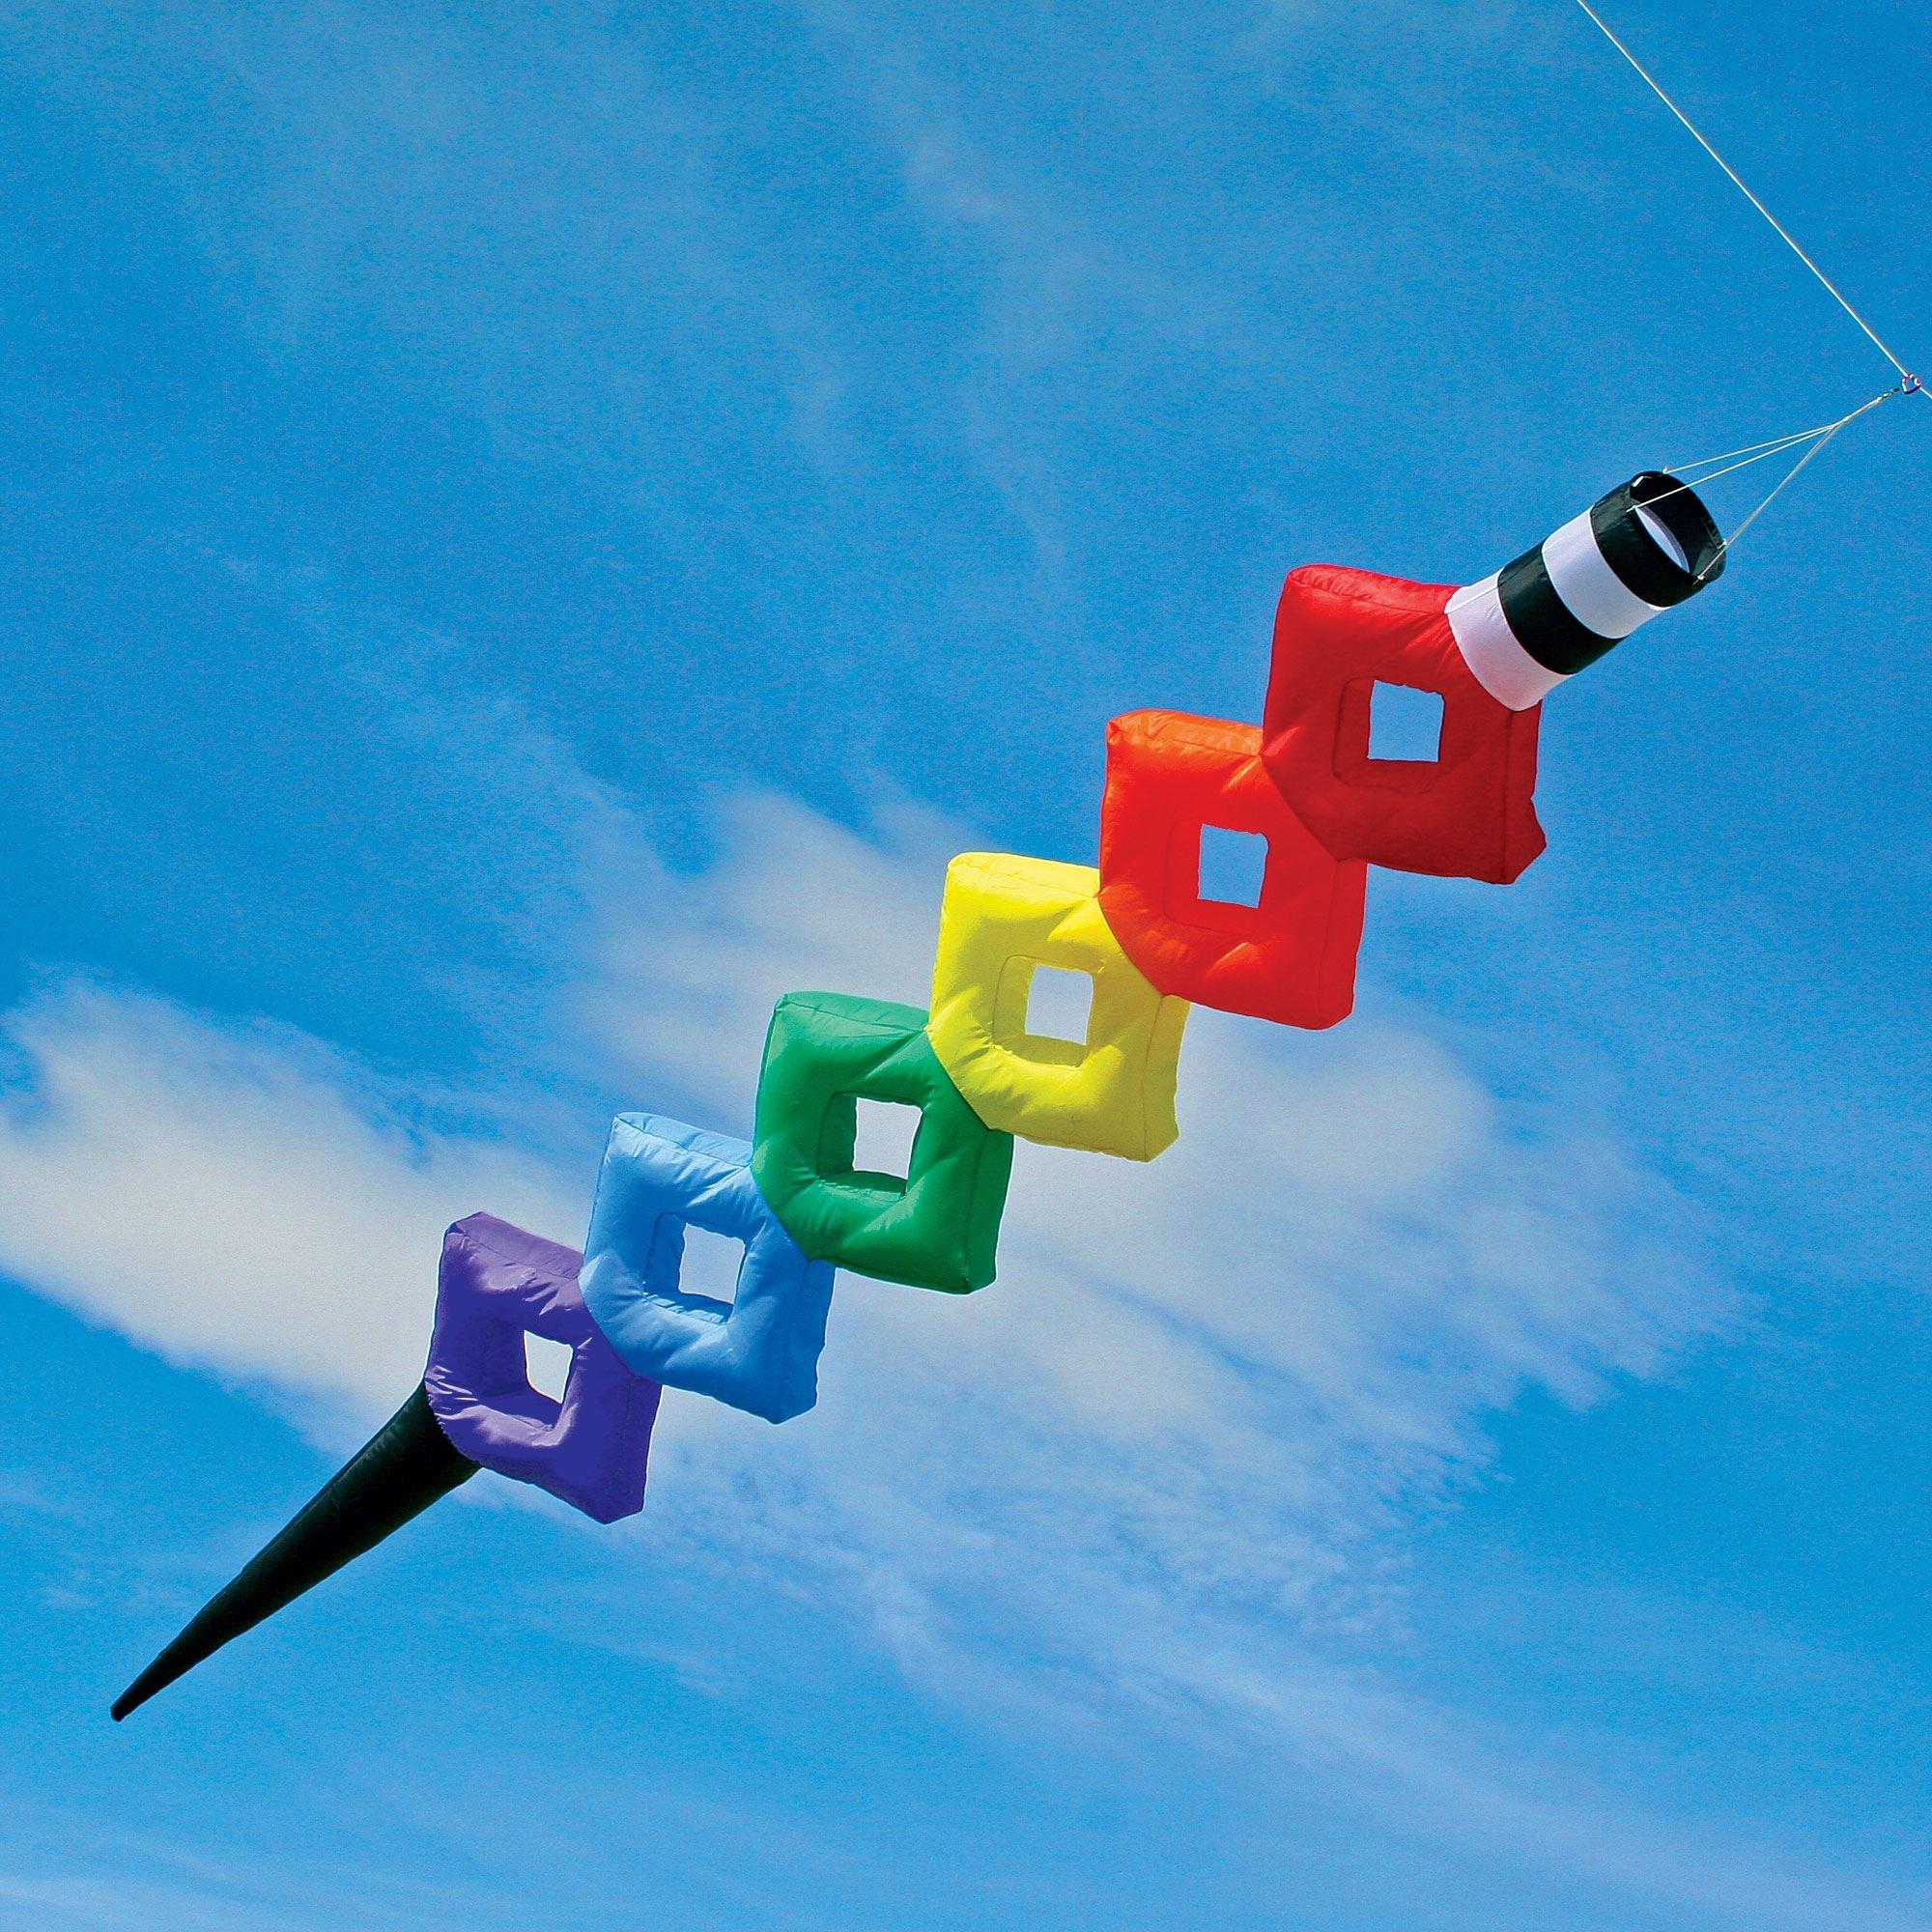 15' Cube Tube Kite Line Laundry